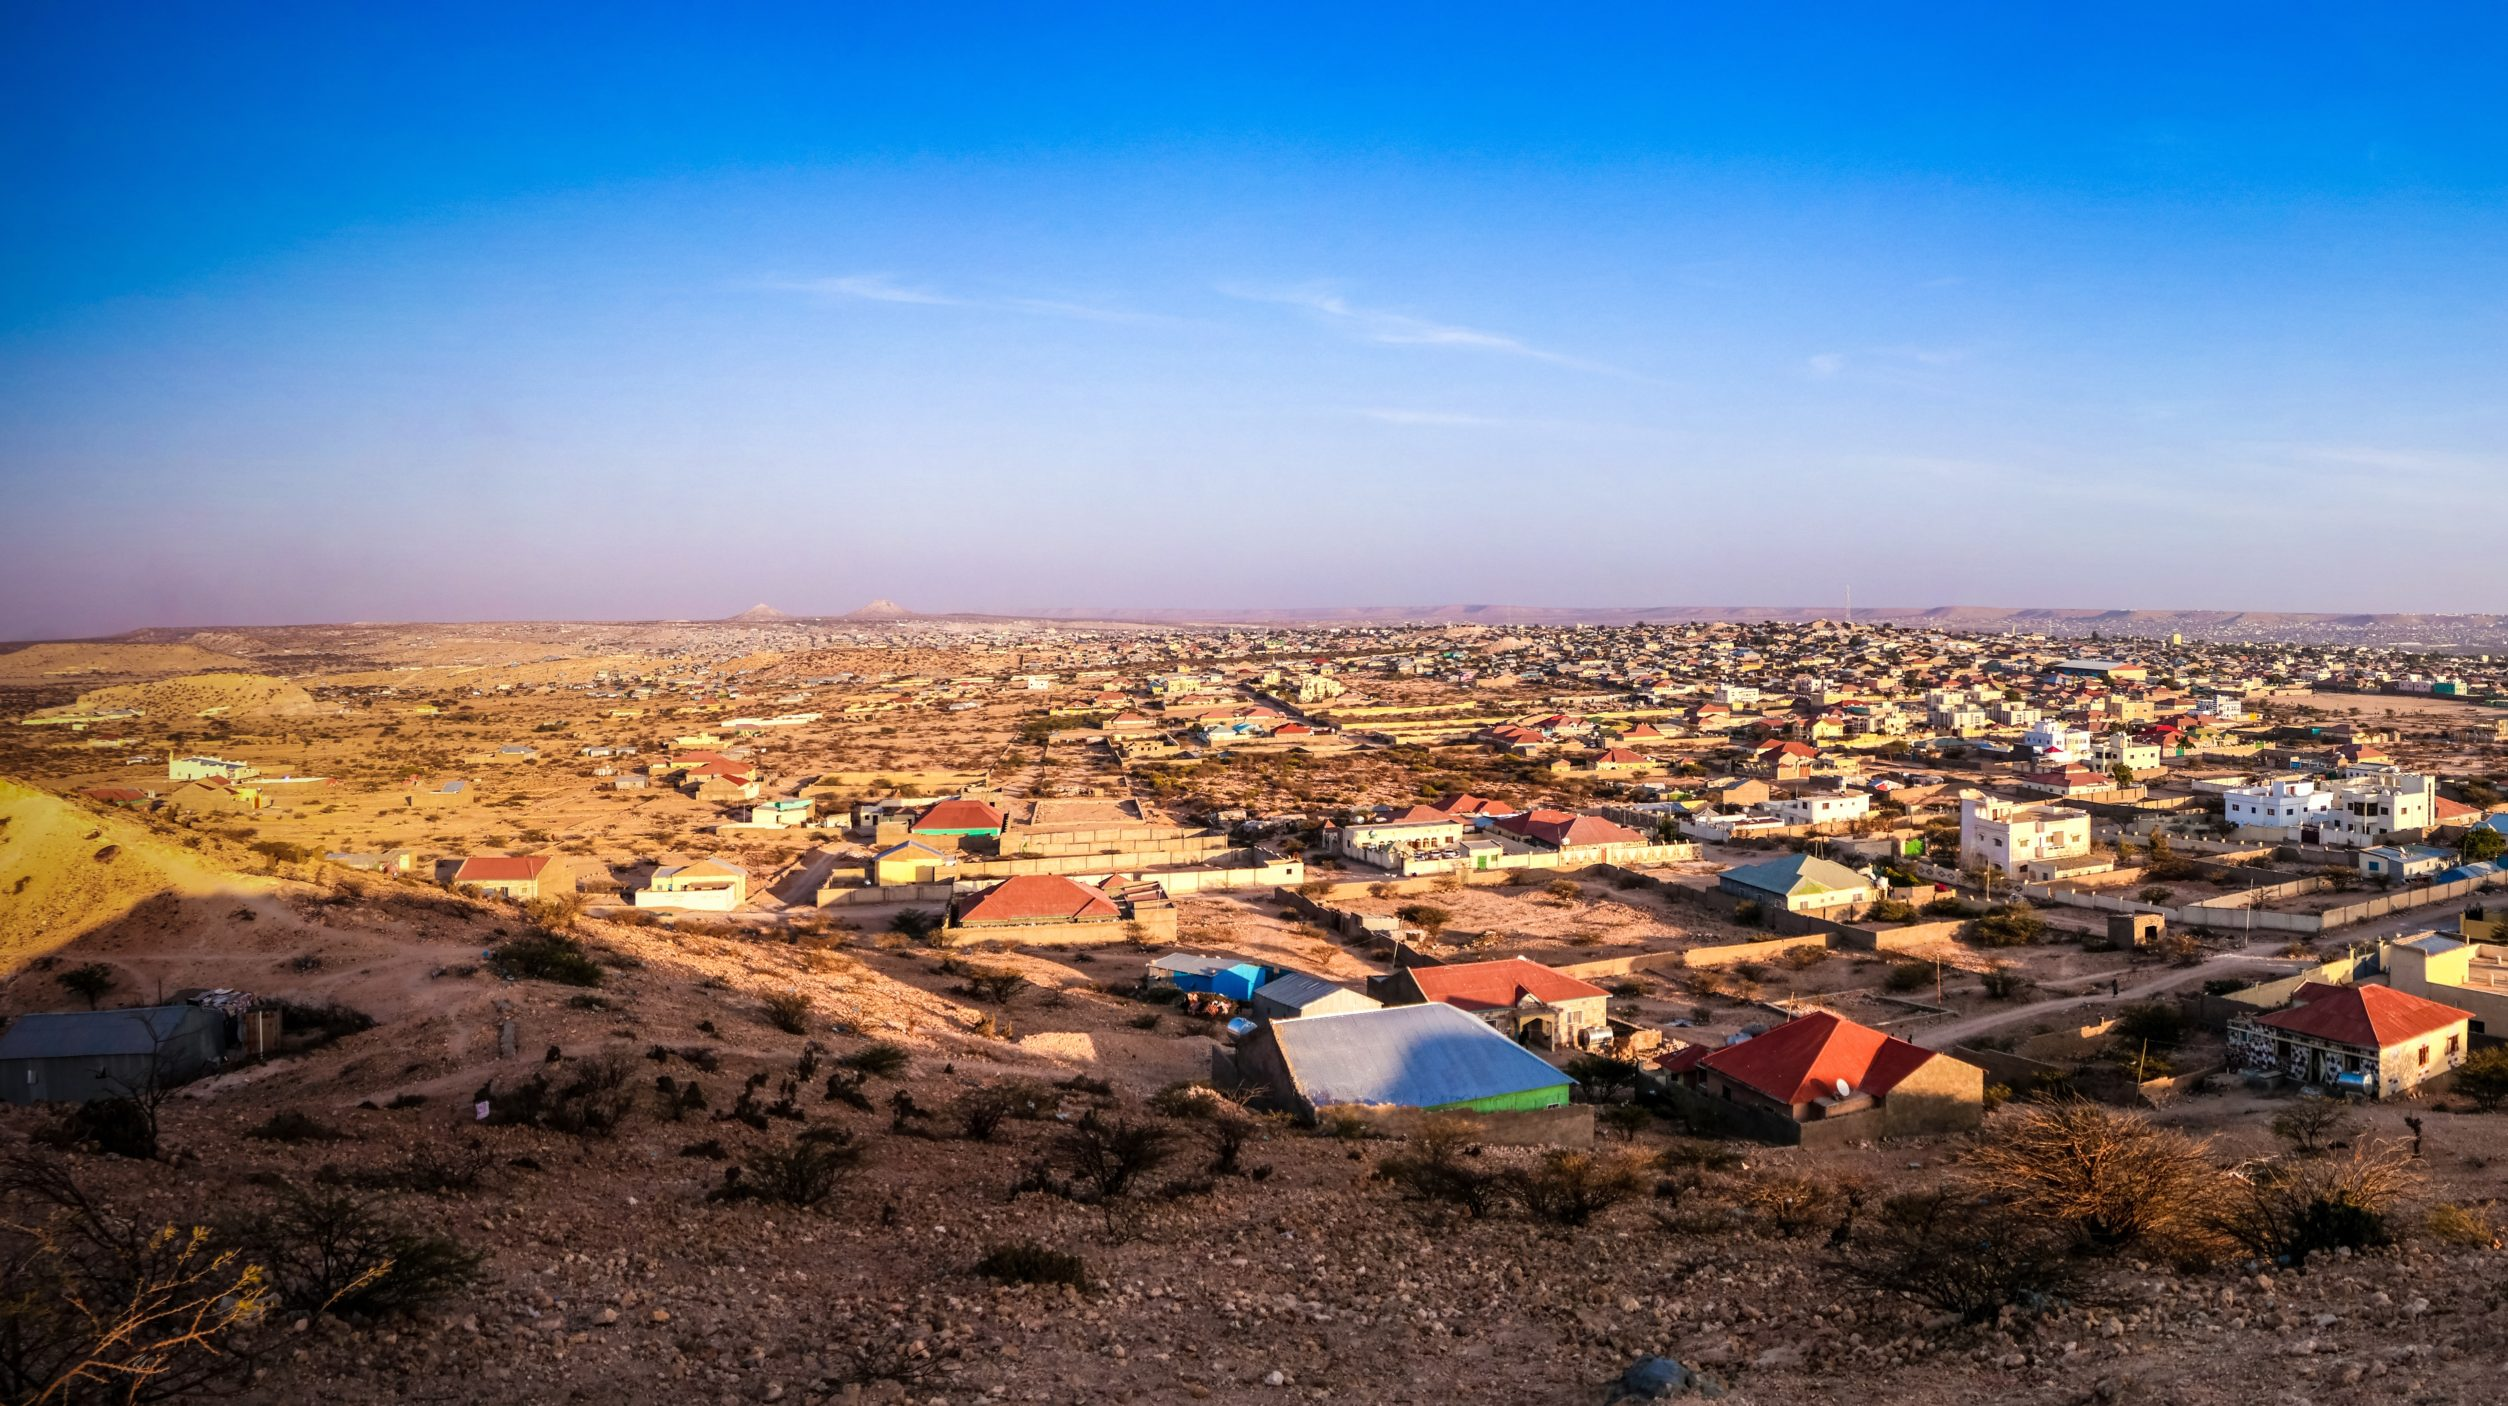 Somalia [shutterstock]